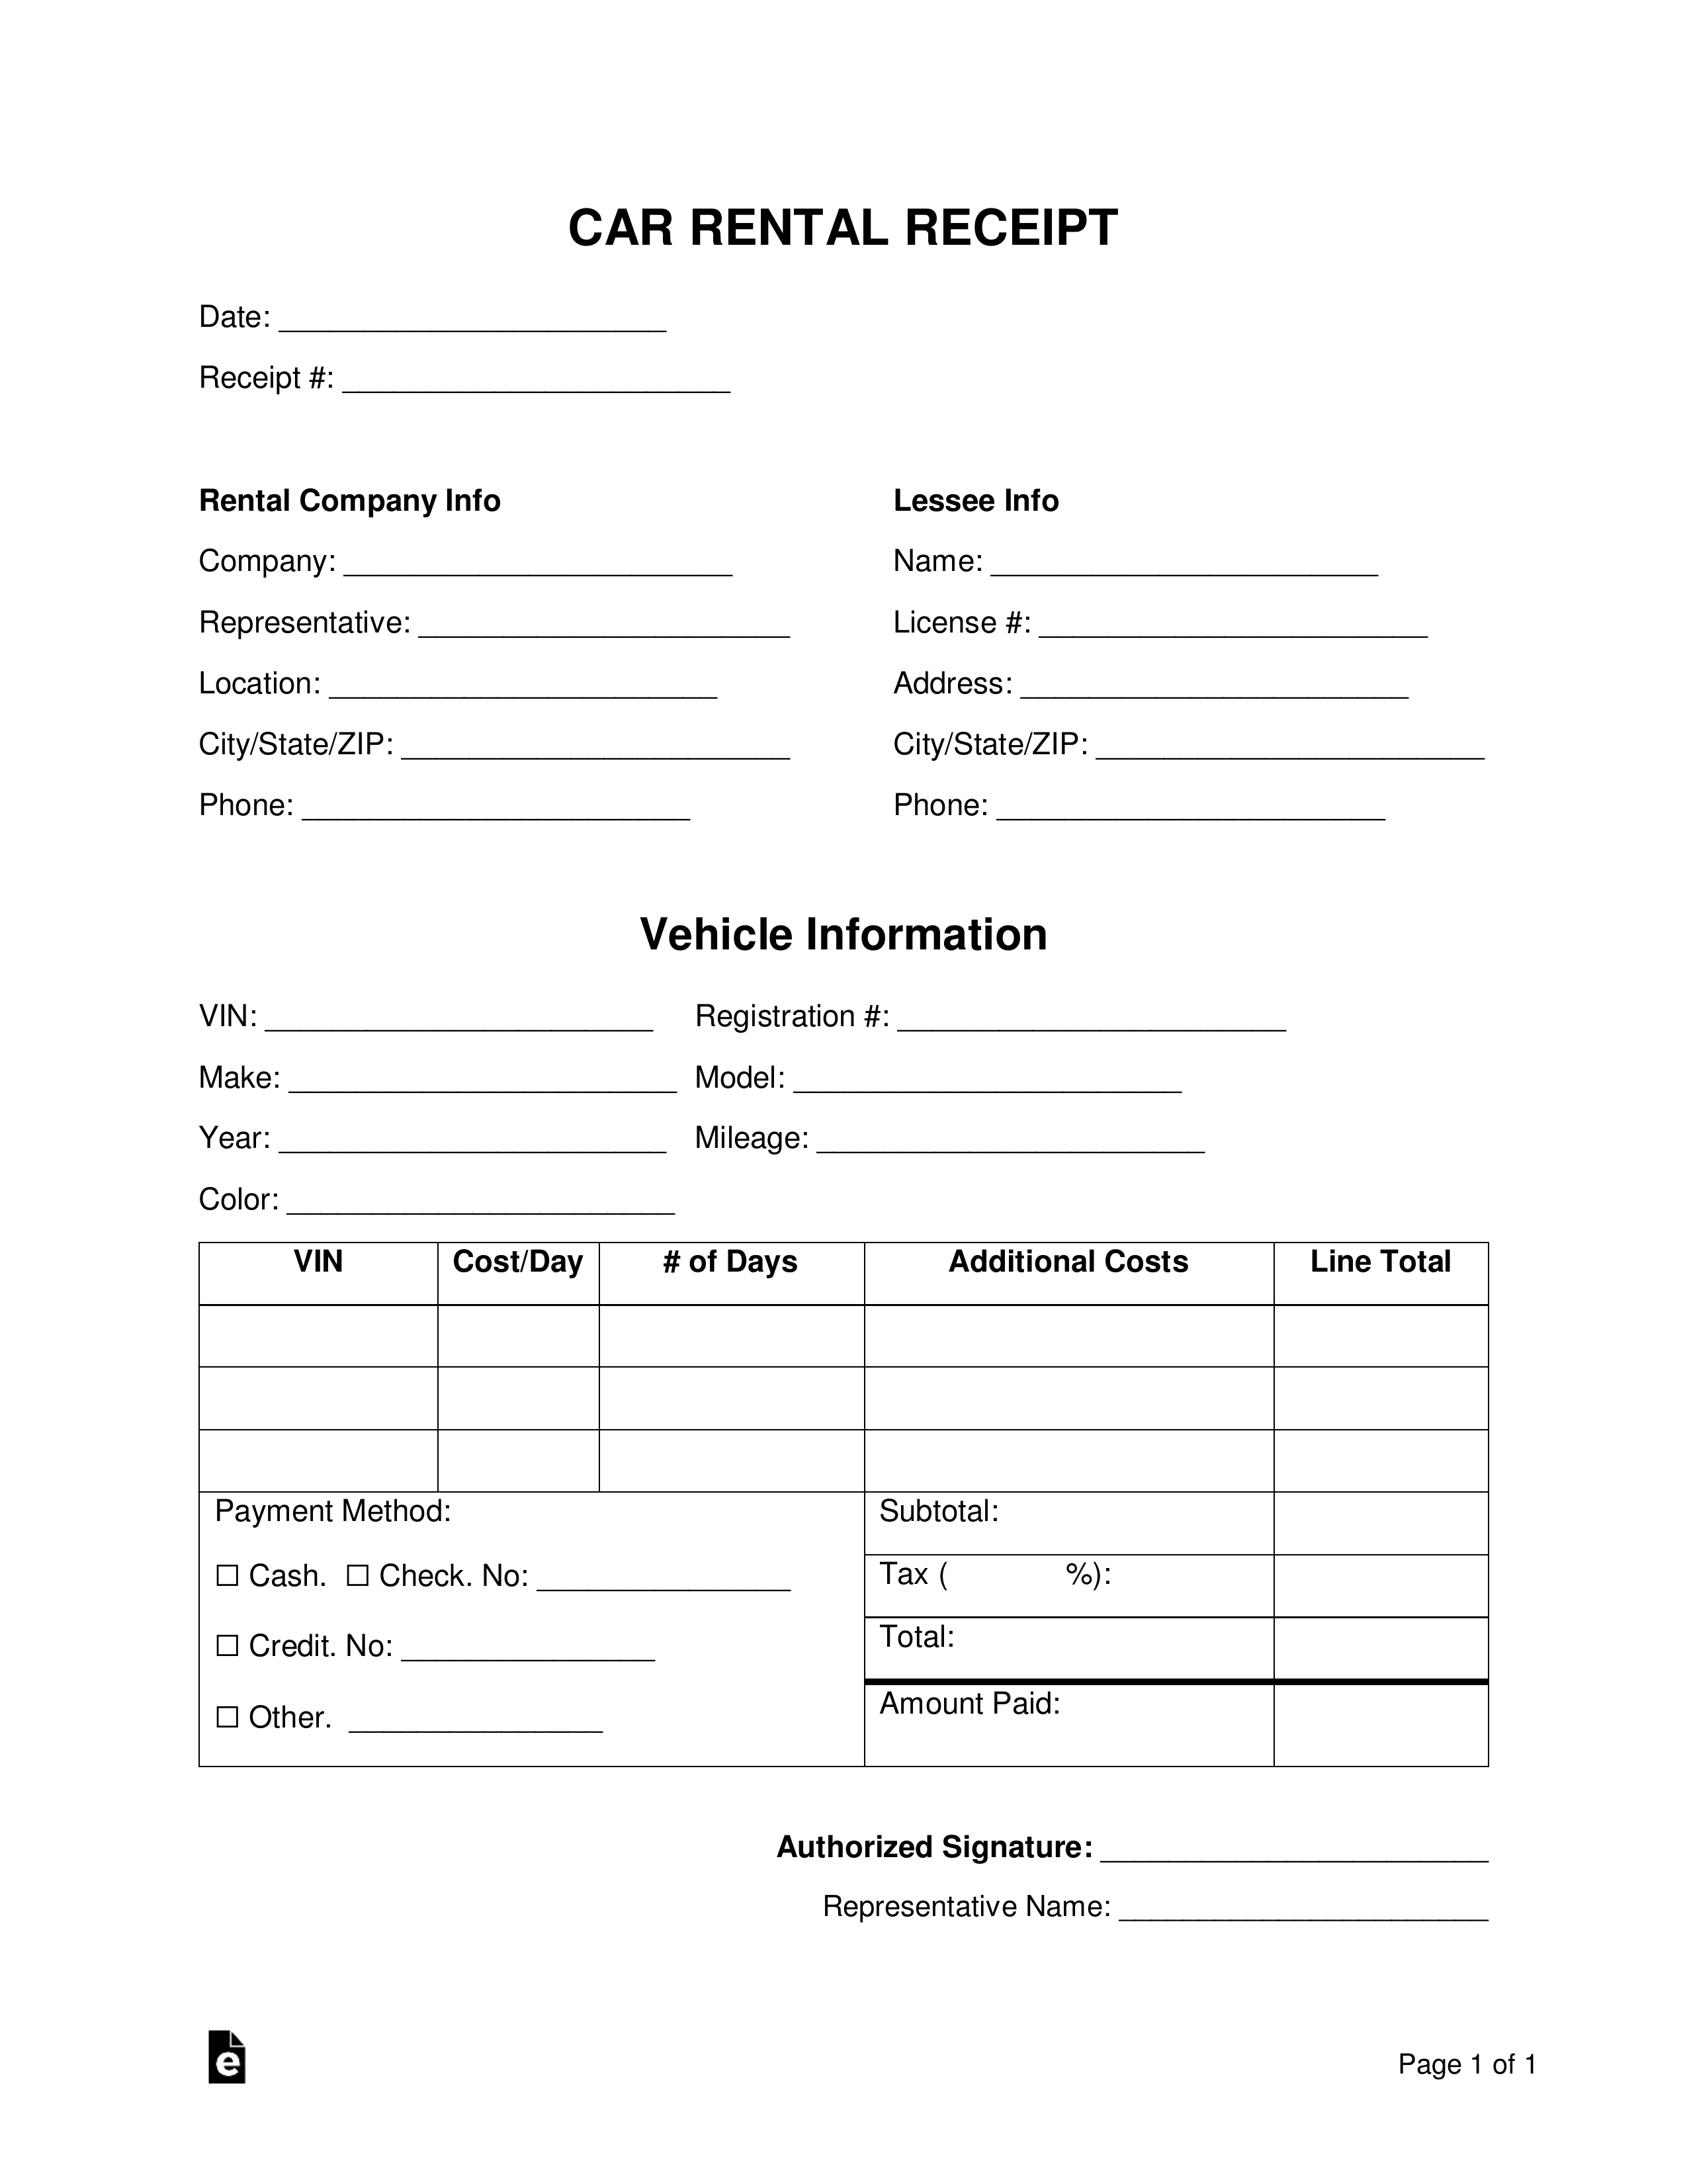 free car rental receipt template word pdf eforms receipt for car hire